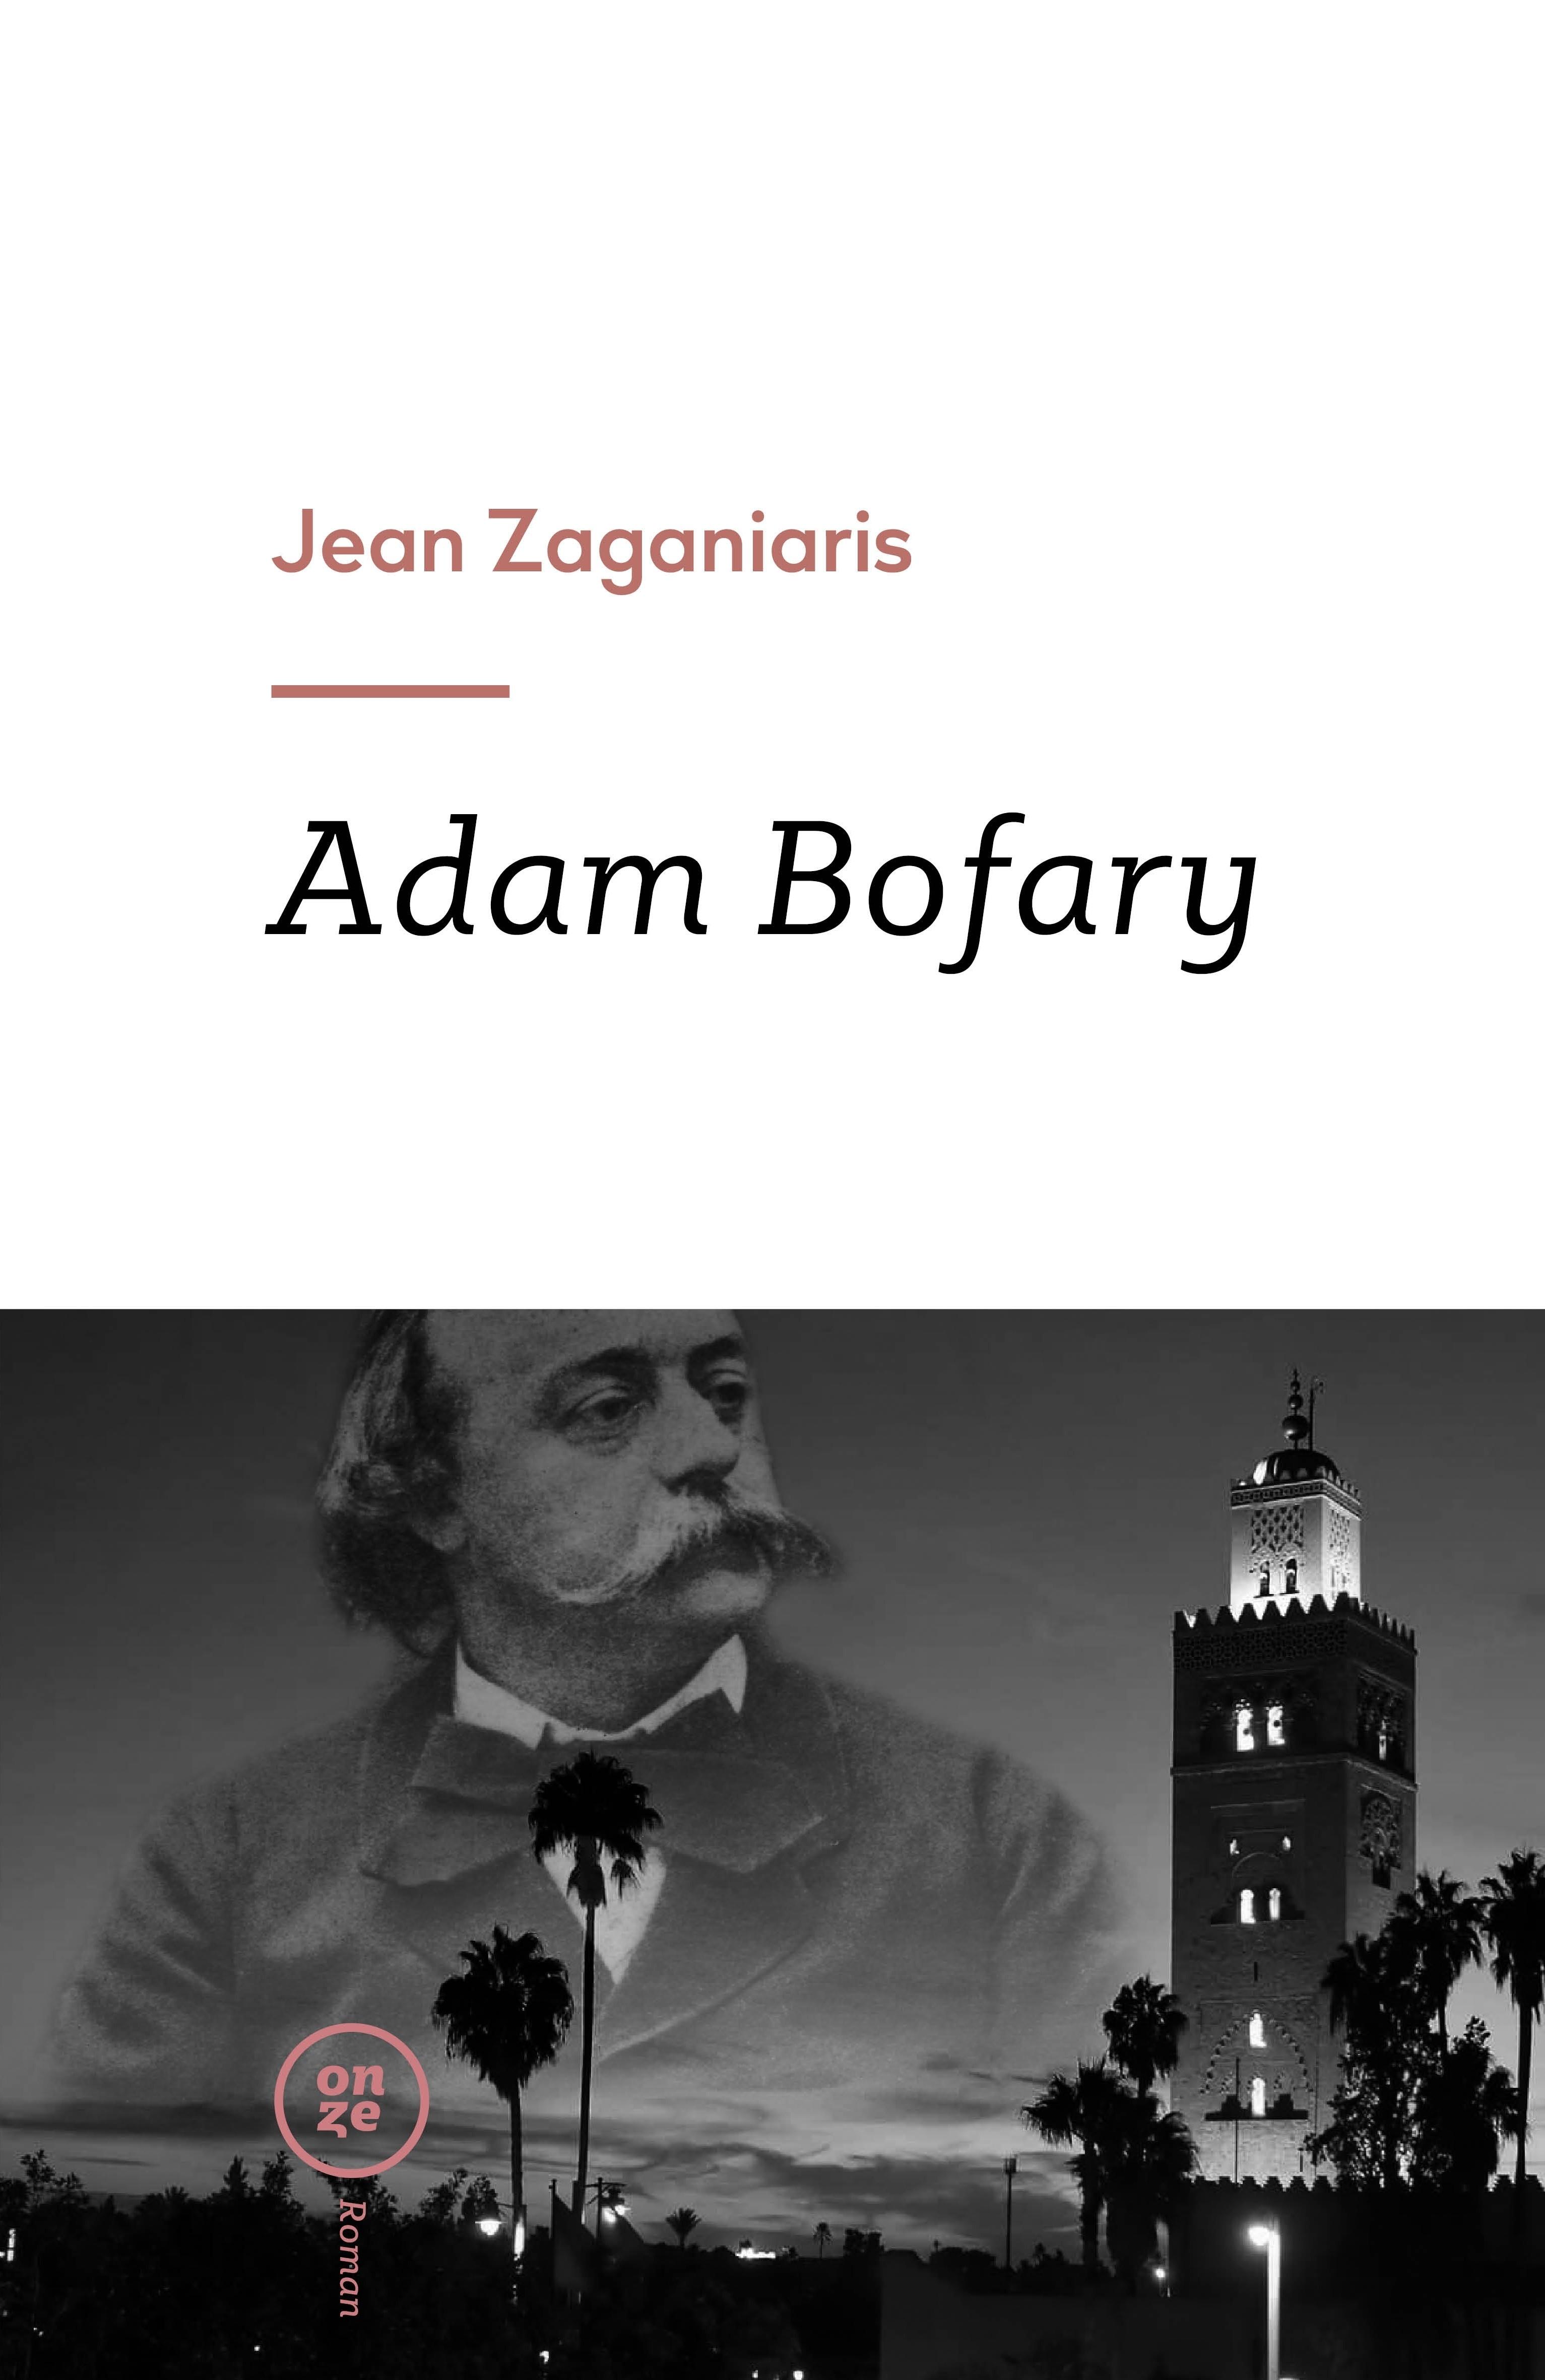 Adam bofary